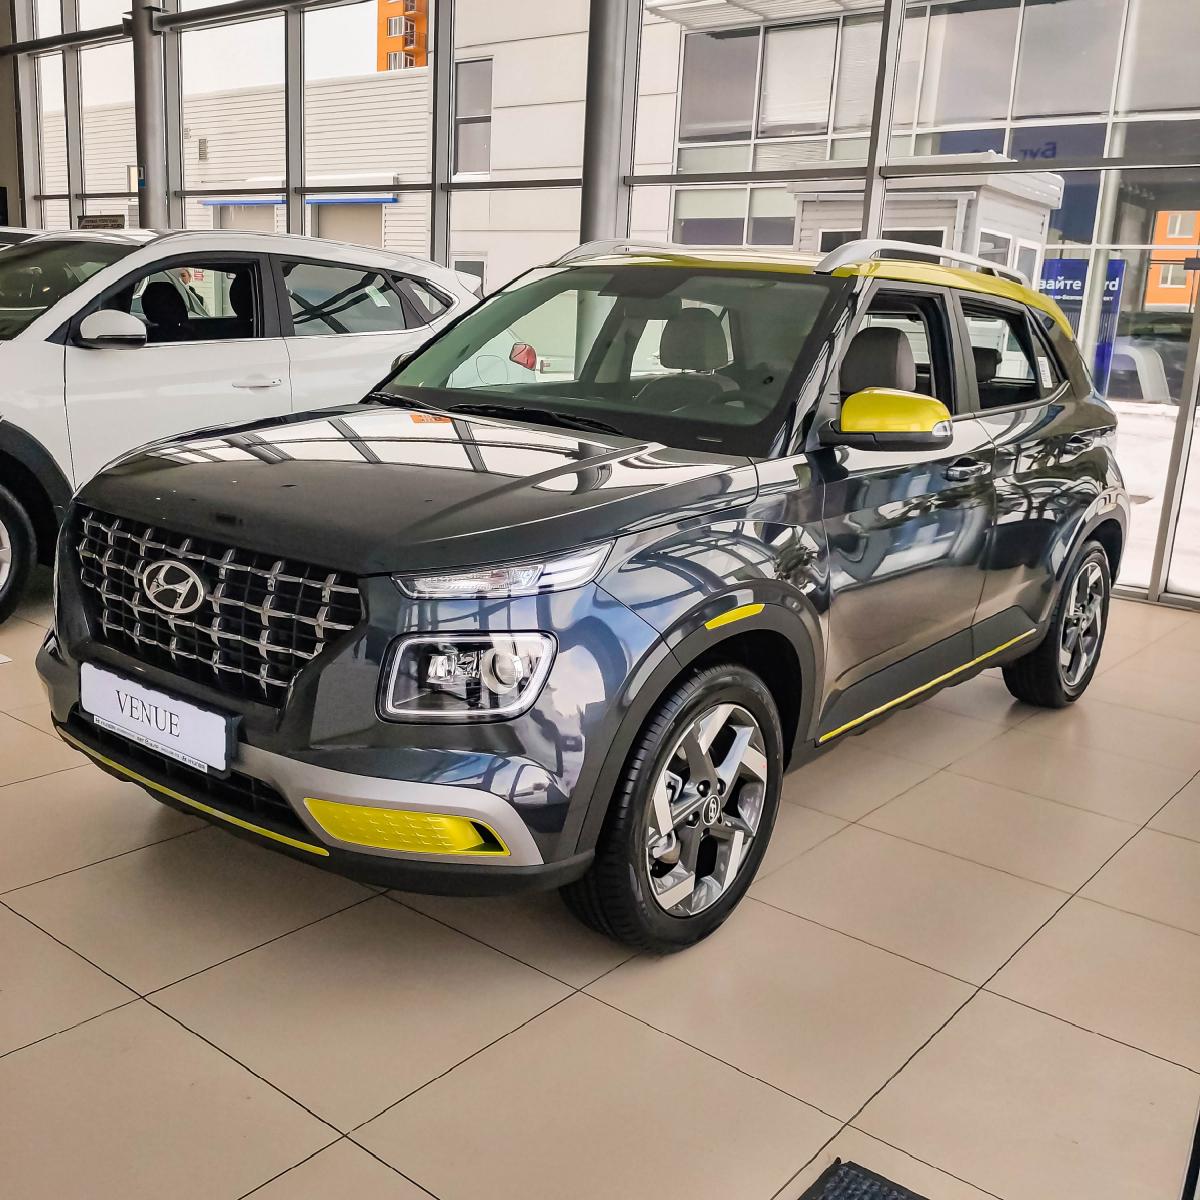 Абсолютно новий компактний міський кросовер Hyundai Venue | Хюндай Мотор Україна - фото 17